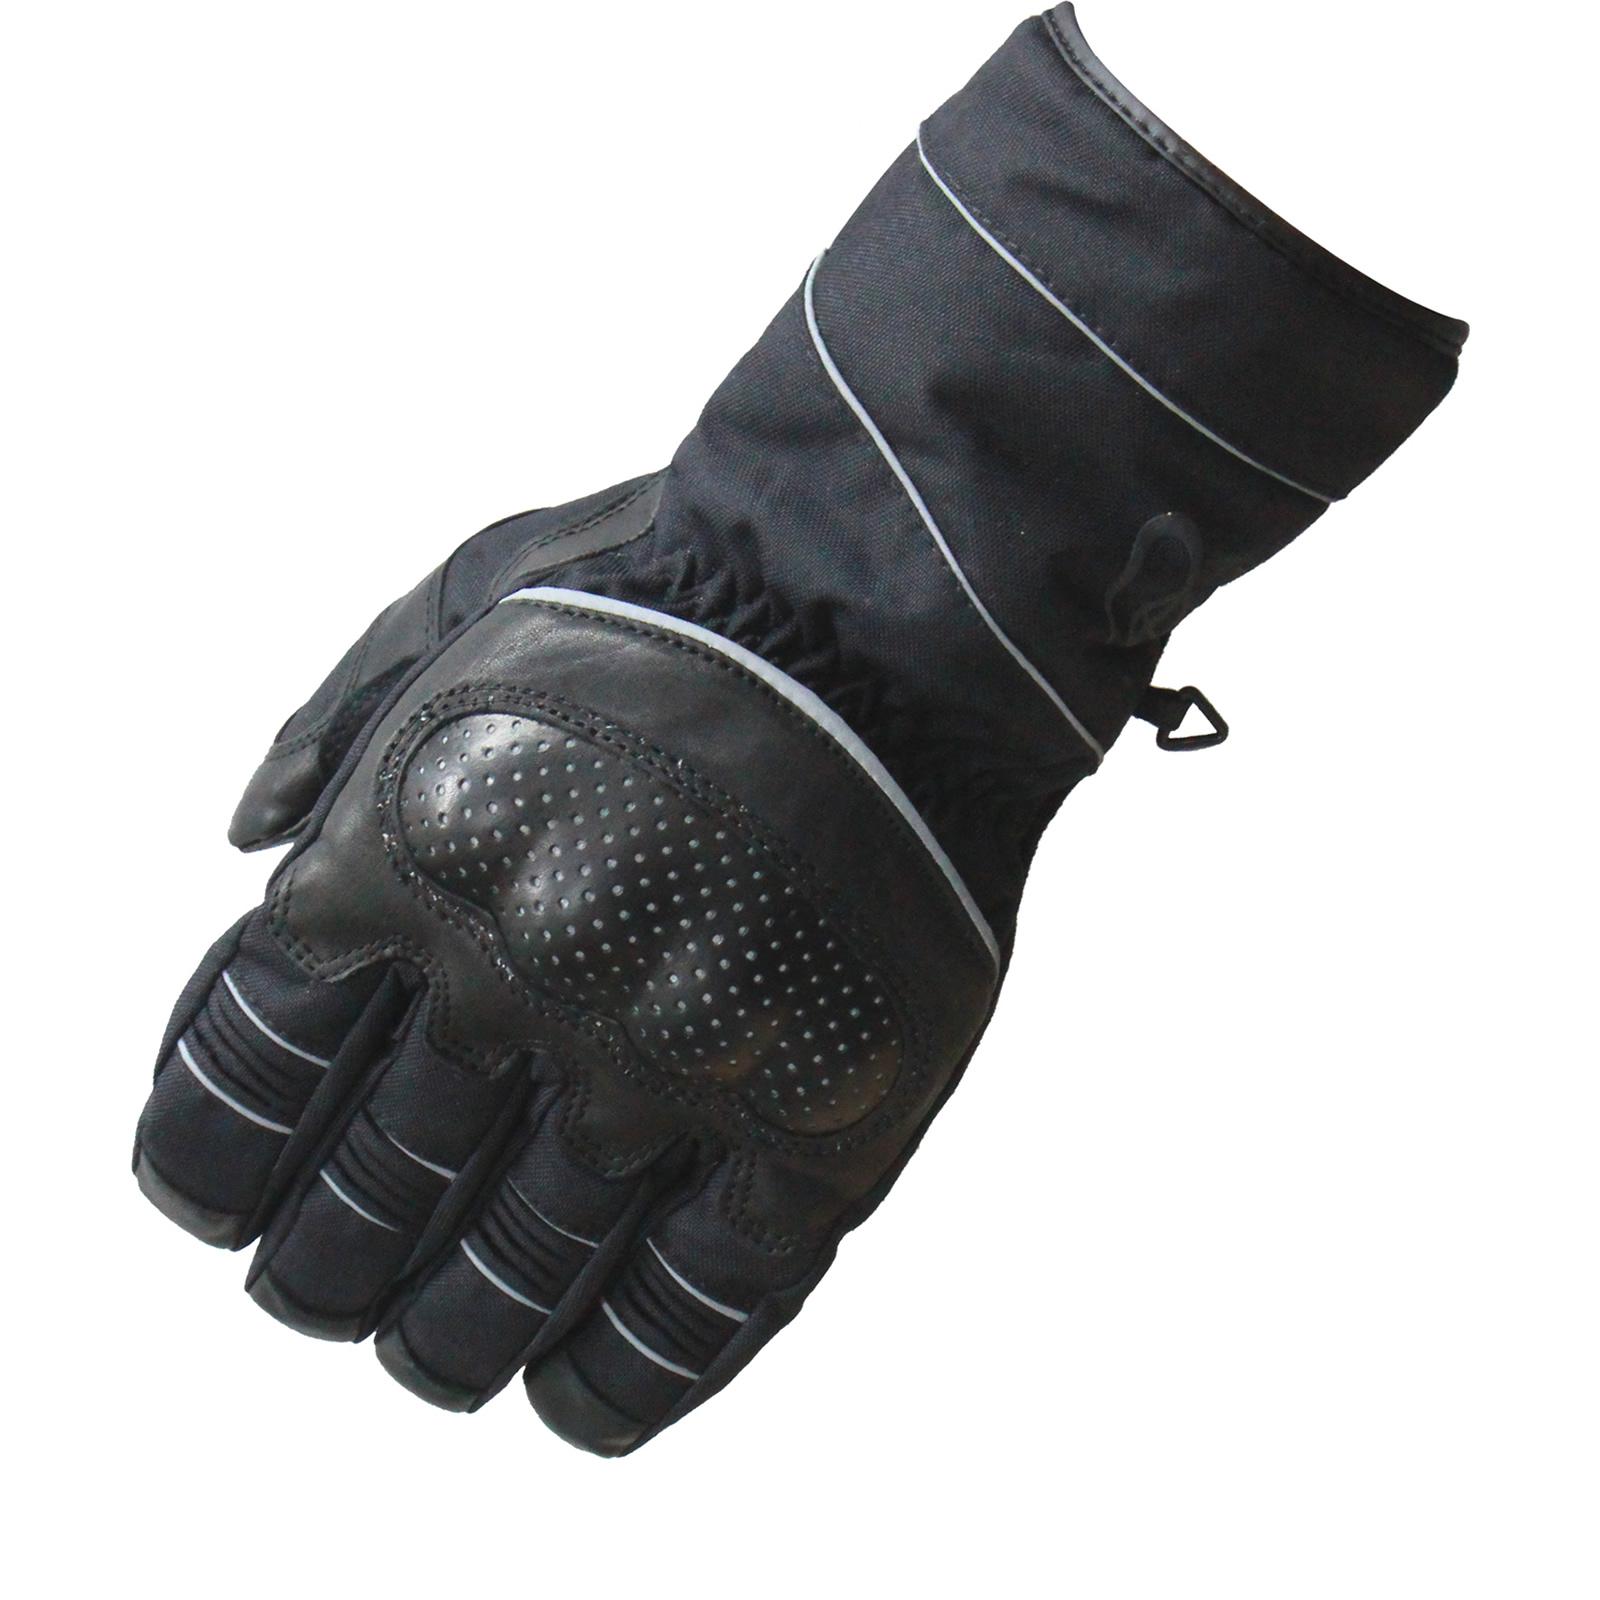 Black Winter Waterproof Leather Textile Motorcycle Gloves